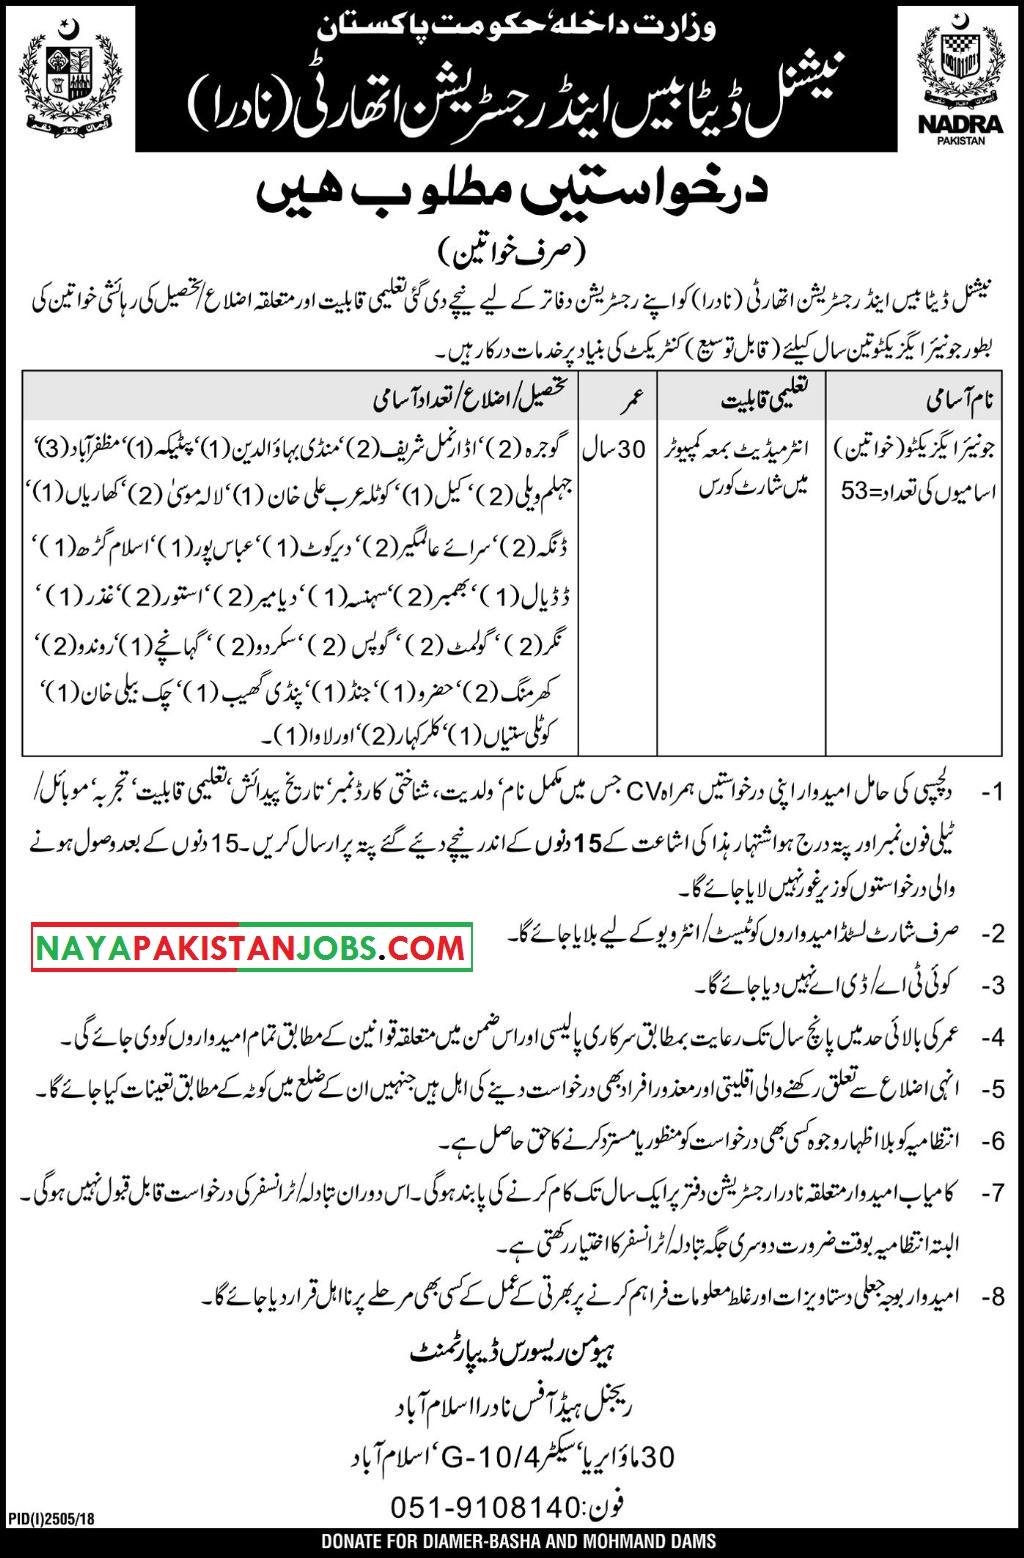 NADRA Jobs Dec Female Junior Executive Islamabad, NADRA Jobs, NADRA Islamabad Jobs for female Dec 2018, nadra.gov.pk latest jobs female